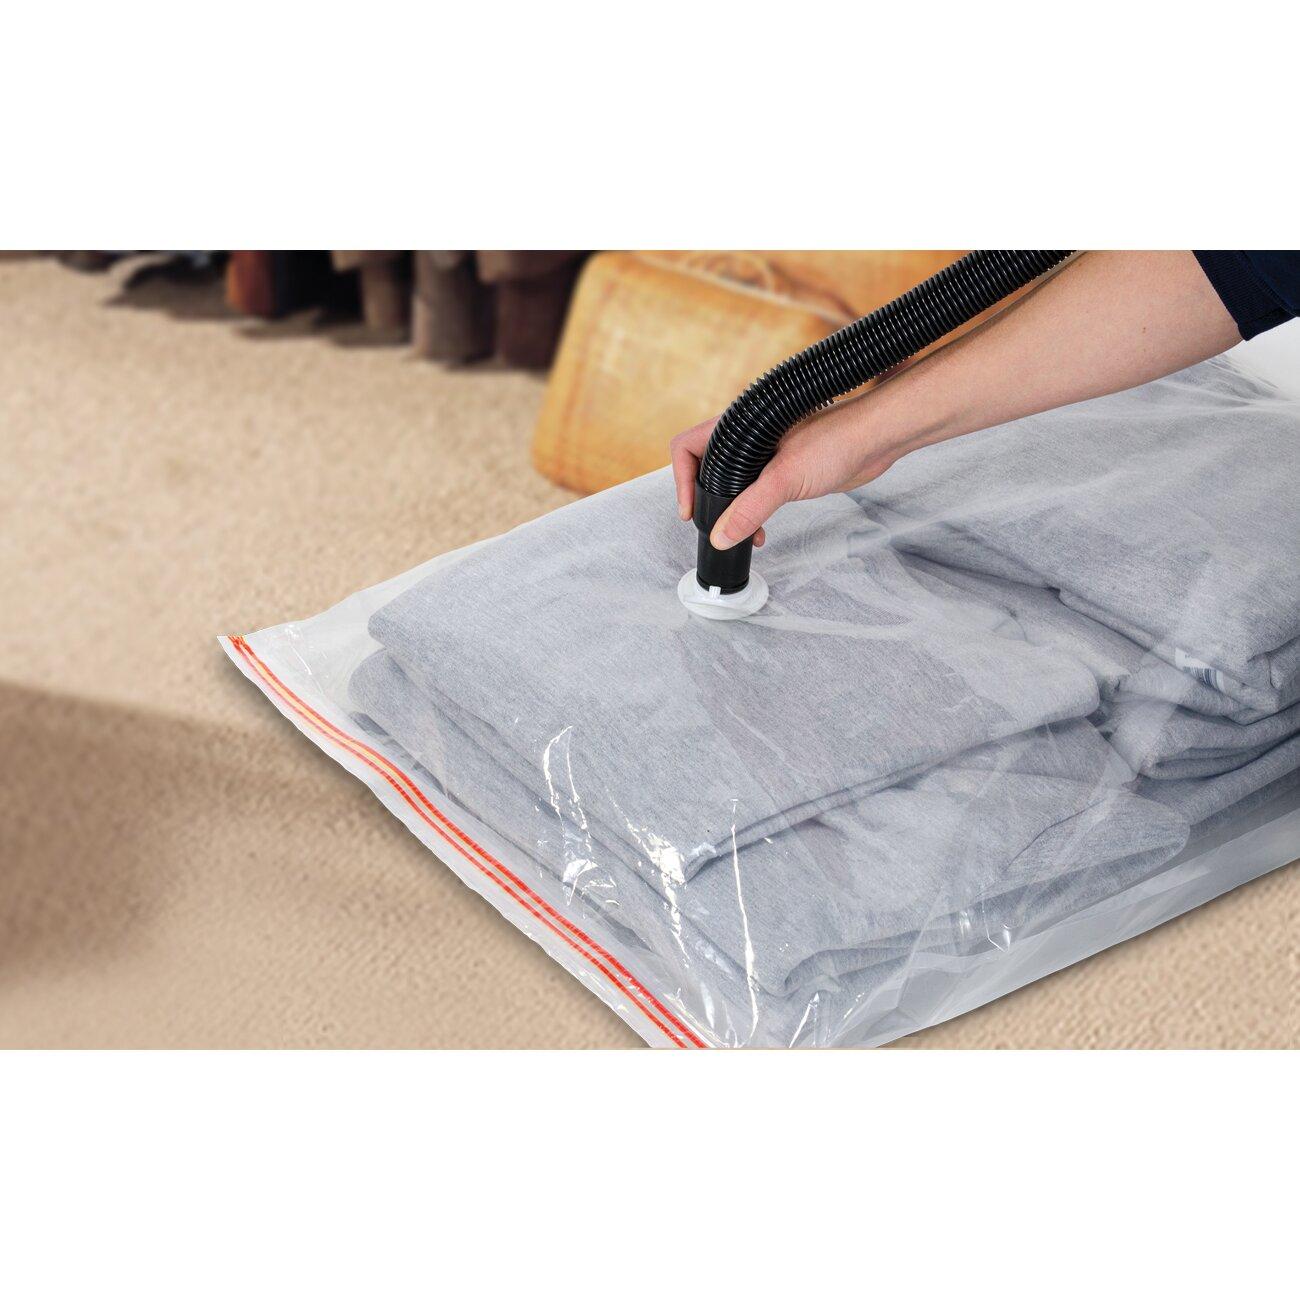 Hefty Shrink Pak Vacuum Storage Bag Reviews Wayfair  sc 1 st  Listitdallas & Storage Solutions Vacuum Bags - Listitdallas